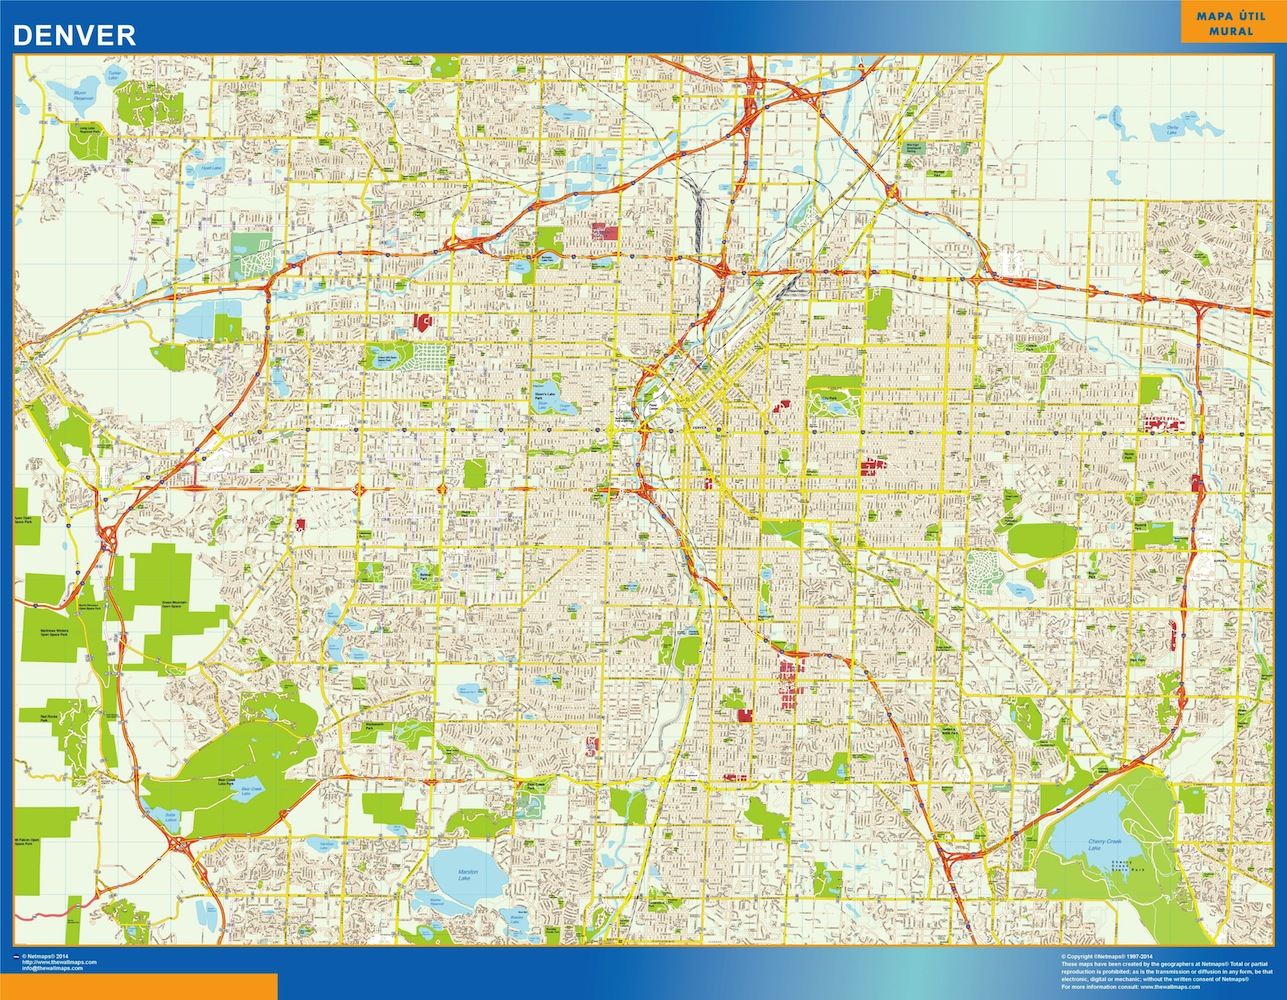 Mapa de Denver plastificado gigante